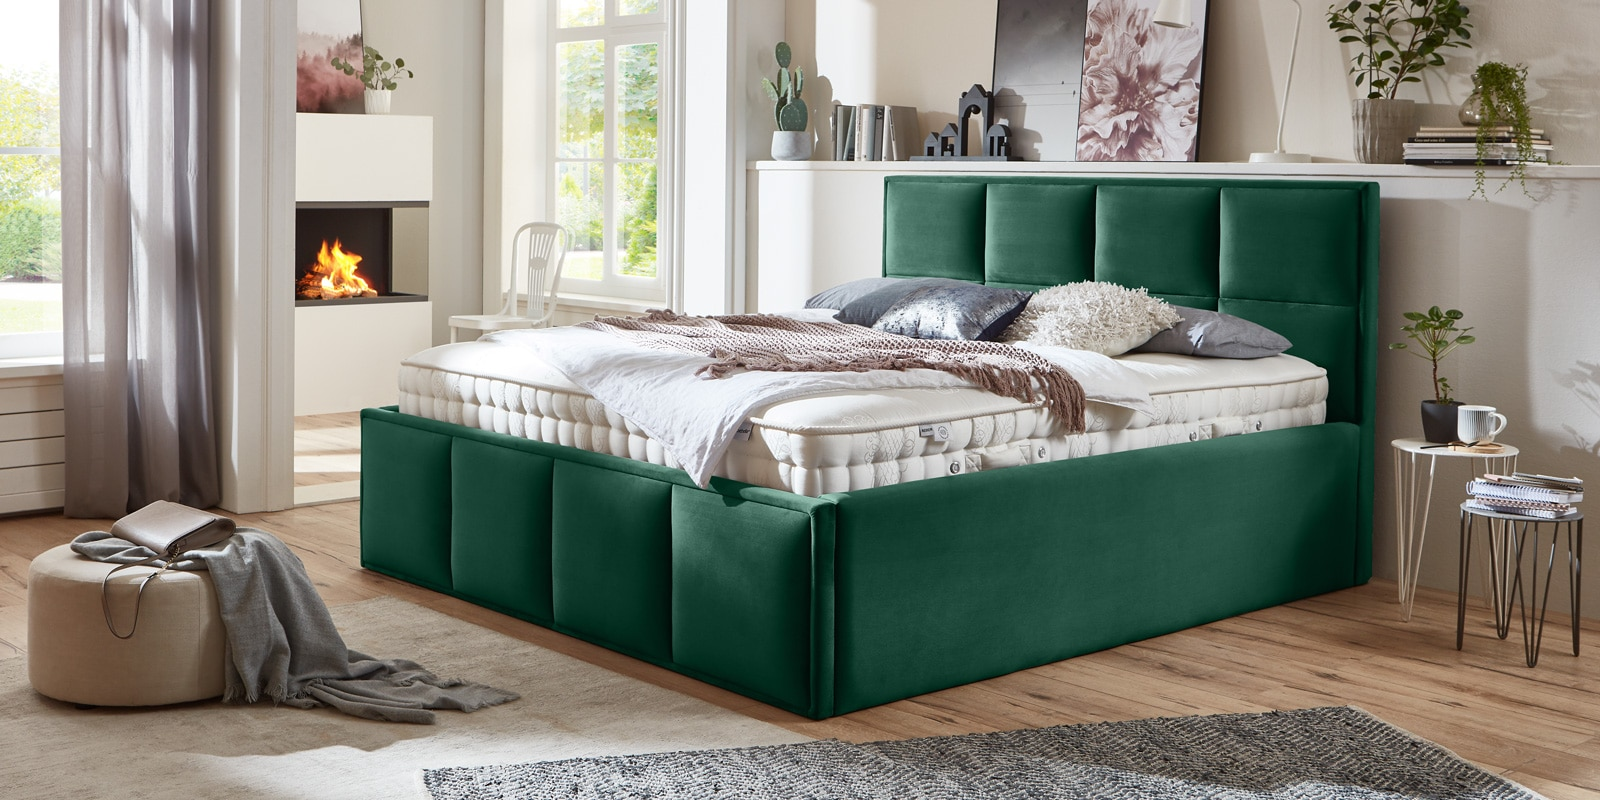 Bett mit Bettkasten Neptun XXL Samt smaragd Stauraumbett Queransicht